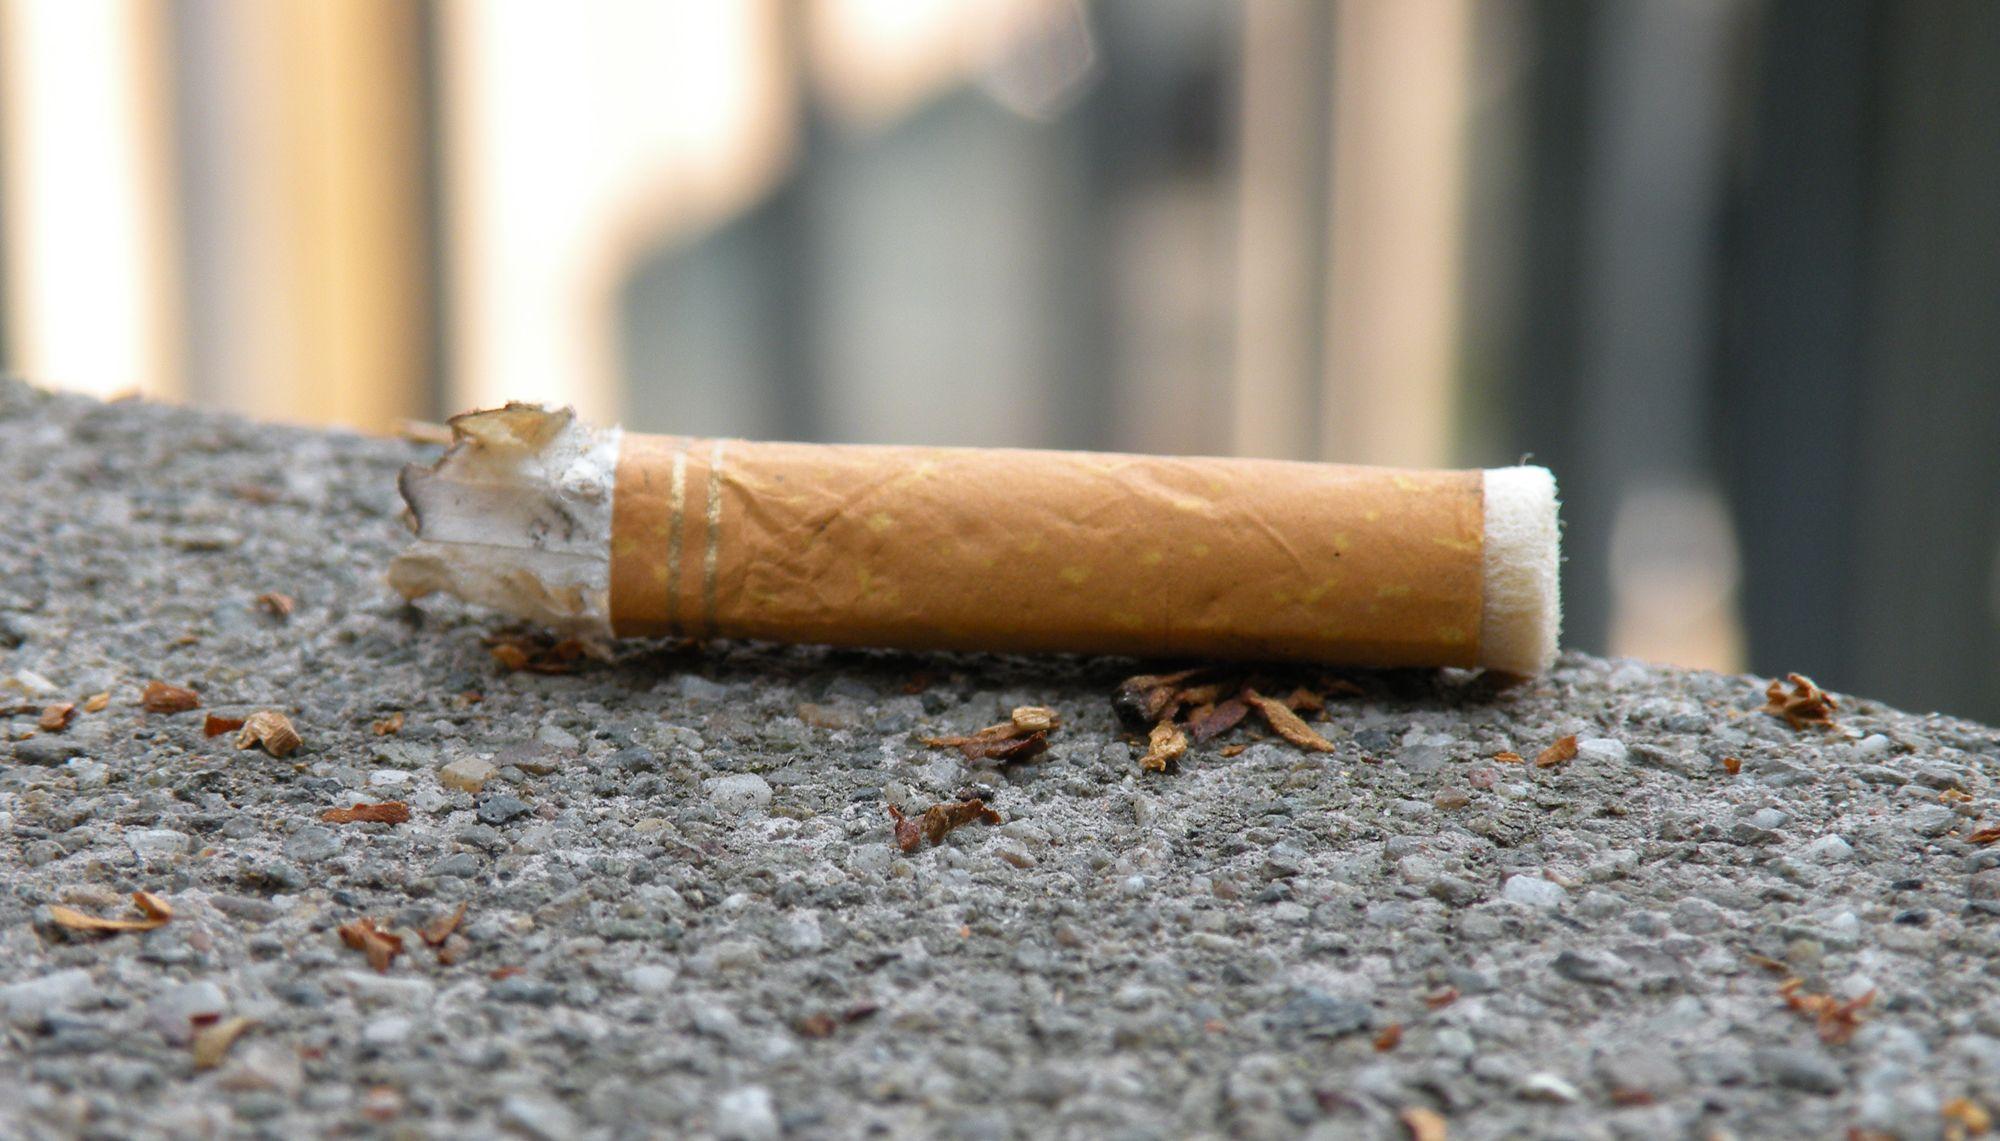 sigaretta-per-terra